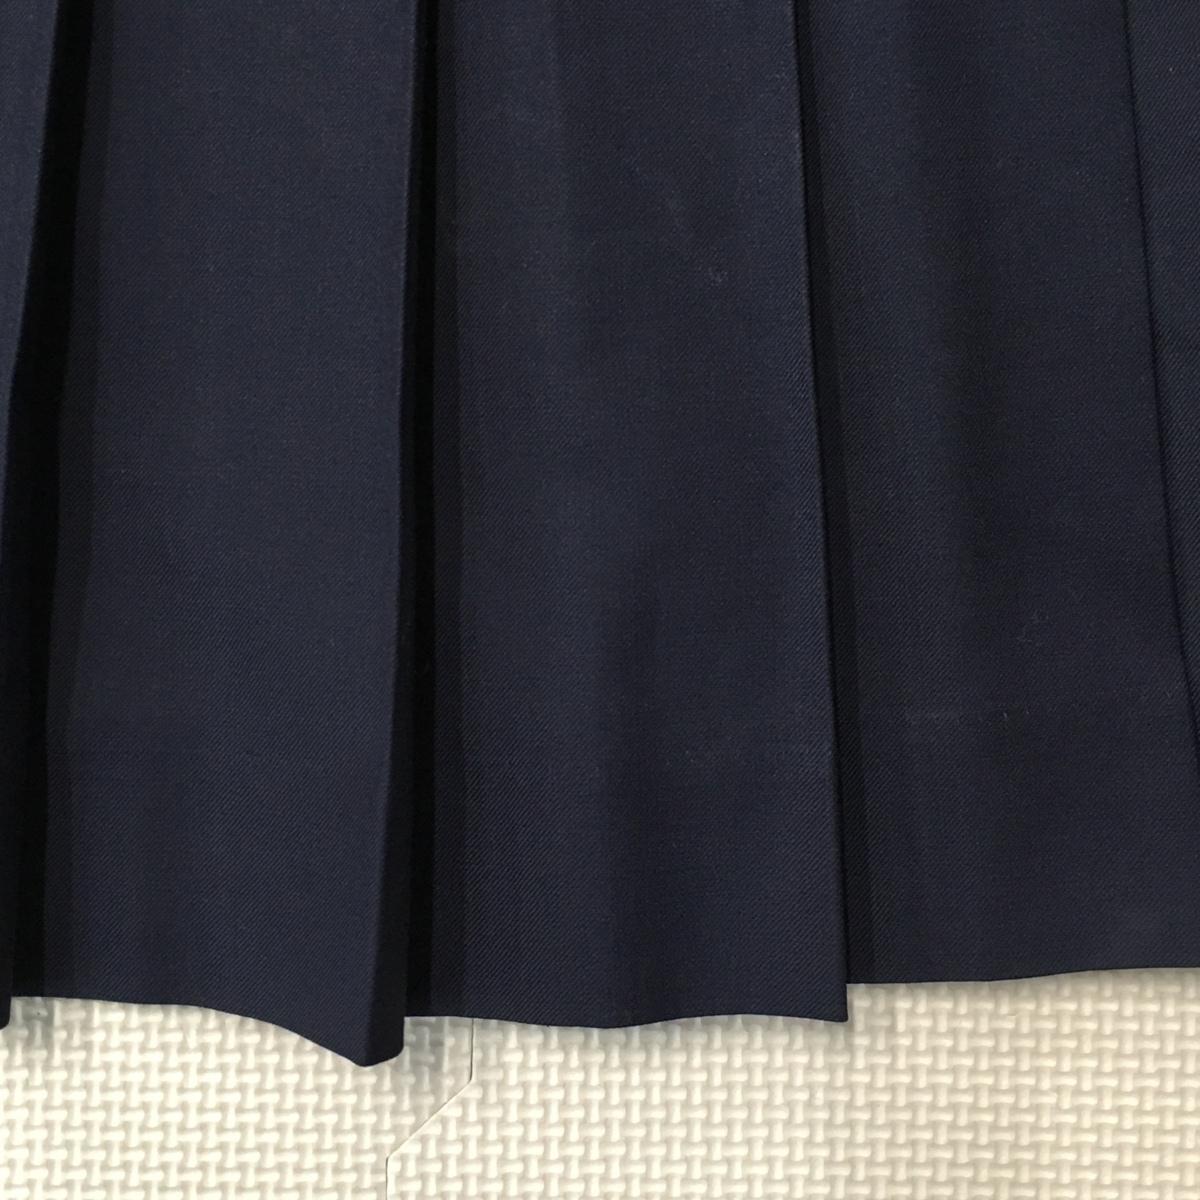 A287 (中古) 東京都 武蔵野女子学院高校 (旧制服) スカート ブラウス 2点セット /指定品/M/W64/長袖/冬用/制服/高校/女子学生/学生服/学生_画像5